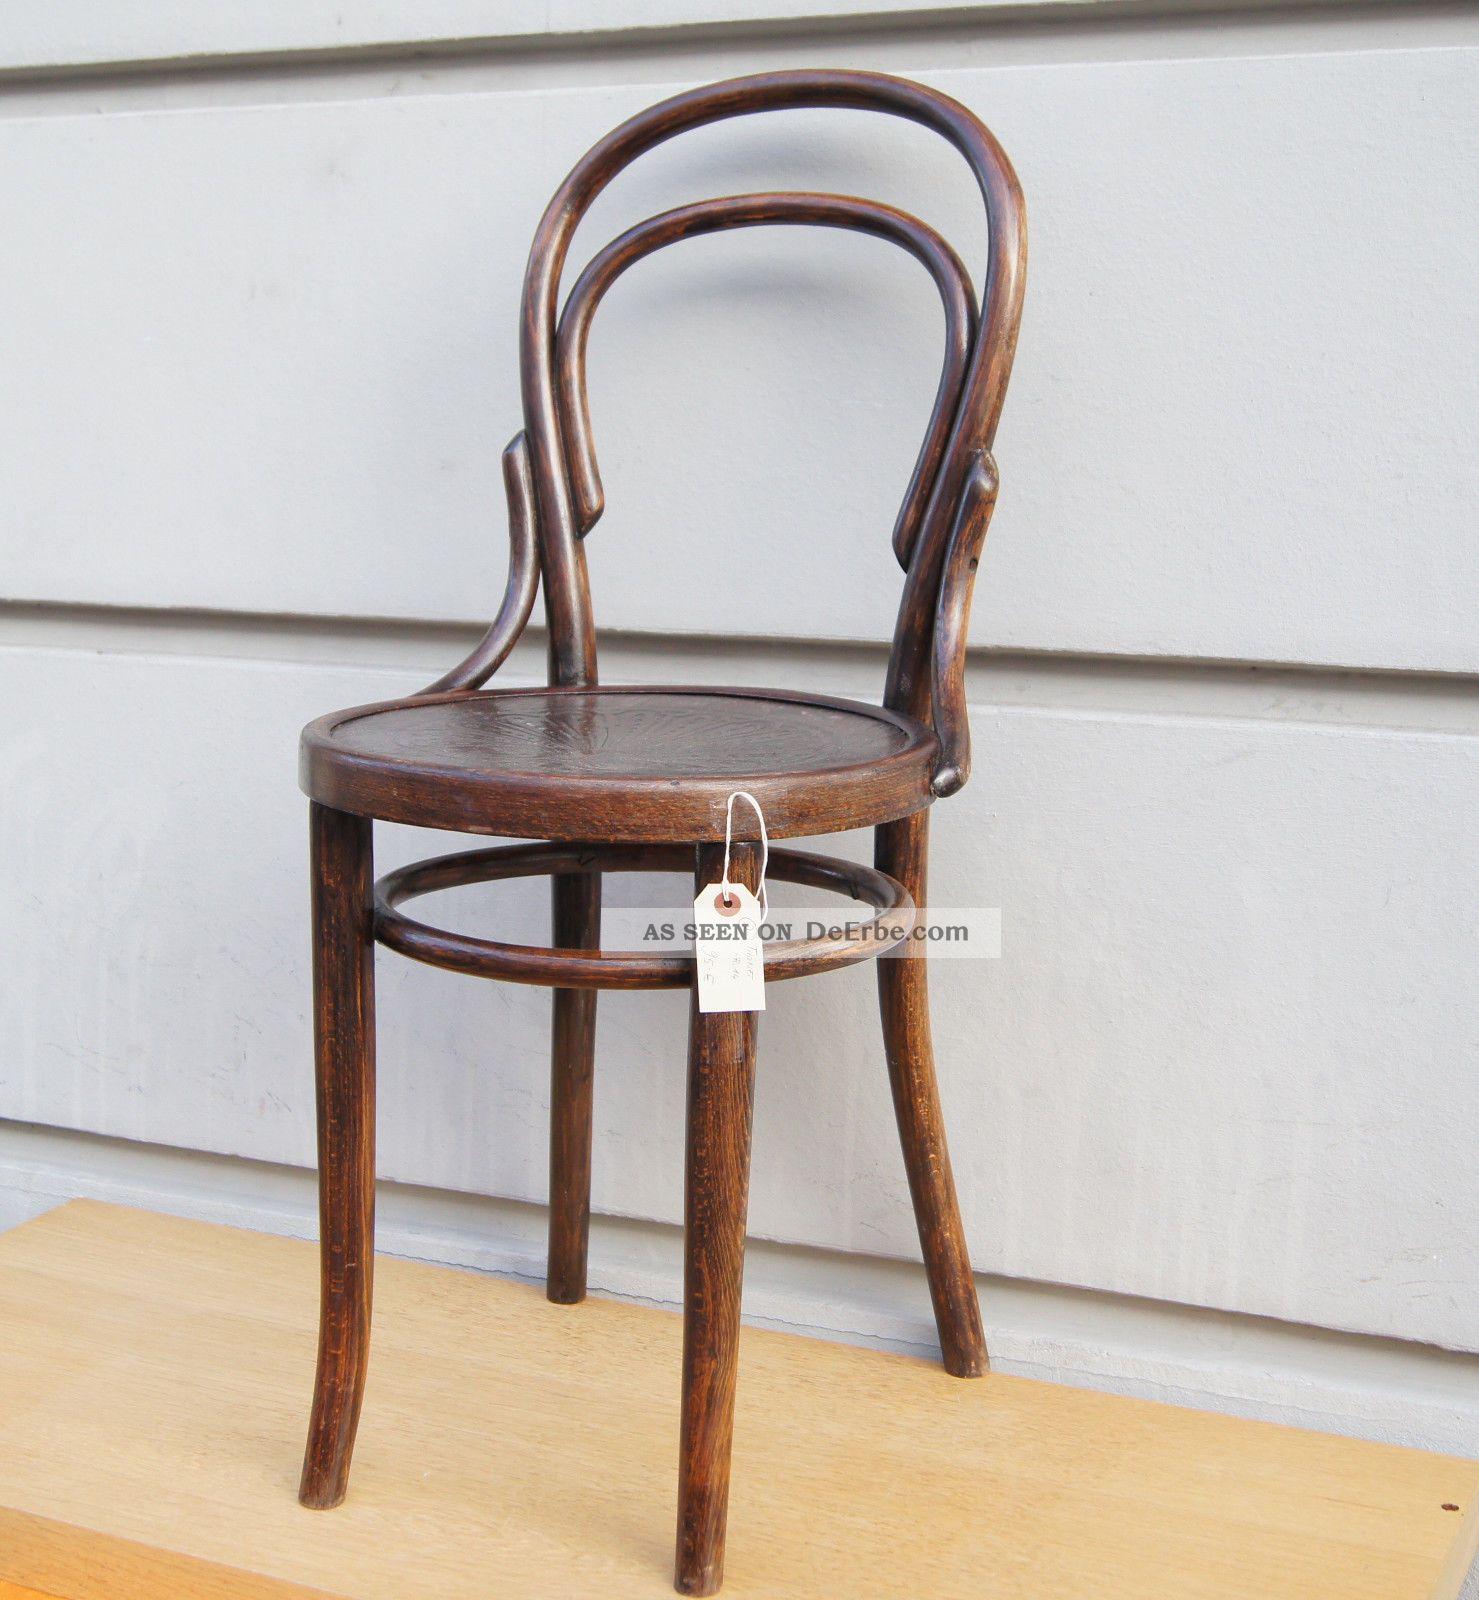 stuhl nr 14 thonet stuhl nr original in michael thonet stuhl nr with stuhl nr 14 elegant. Black Bedroom Furniture Sets. Home Design Ideas